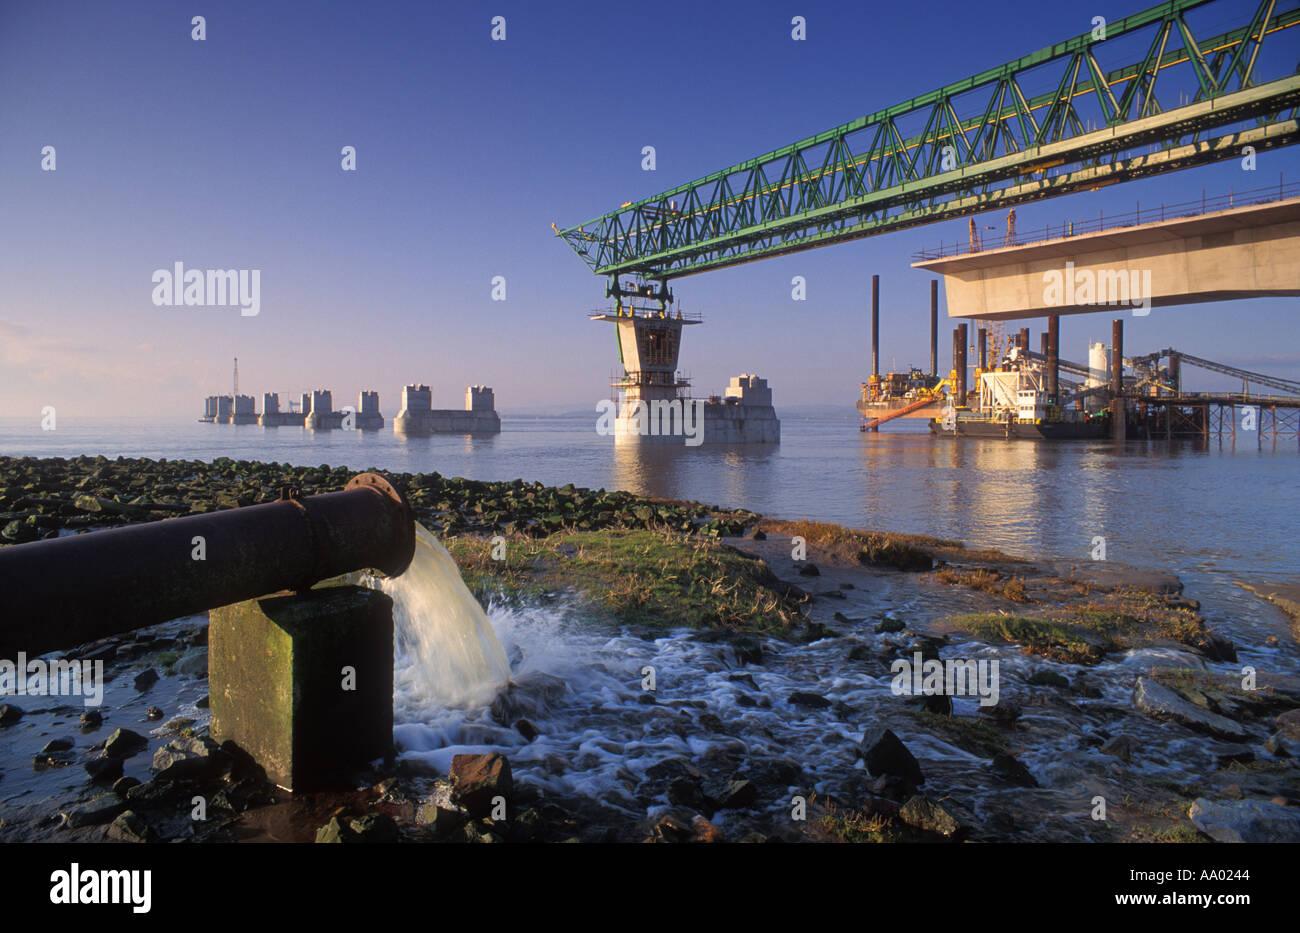 Construction of second Severn crossing Severn Estuary England UK - Stock Image